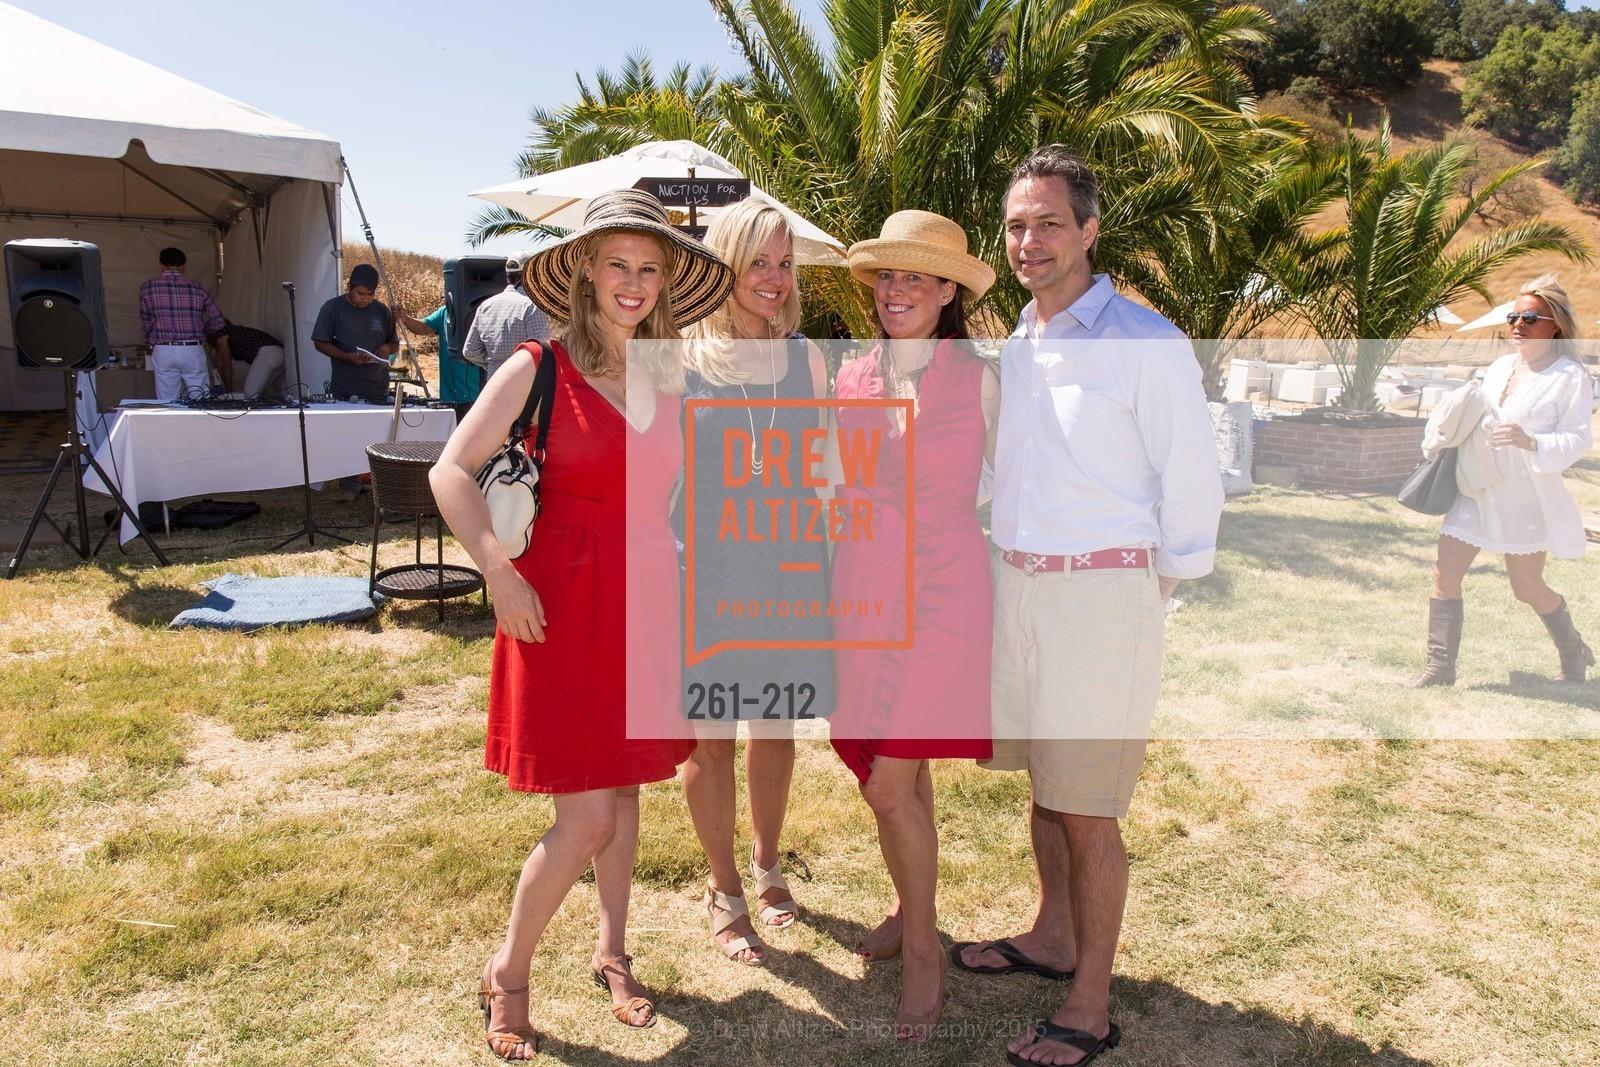 Frances Stark, Ariane Nalty, Charlotte Milan, Chris Spill, Photo #261-212